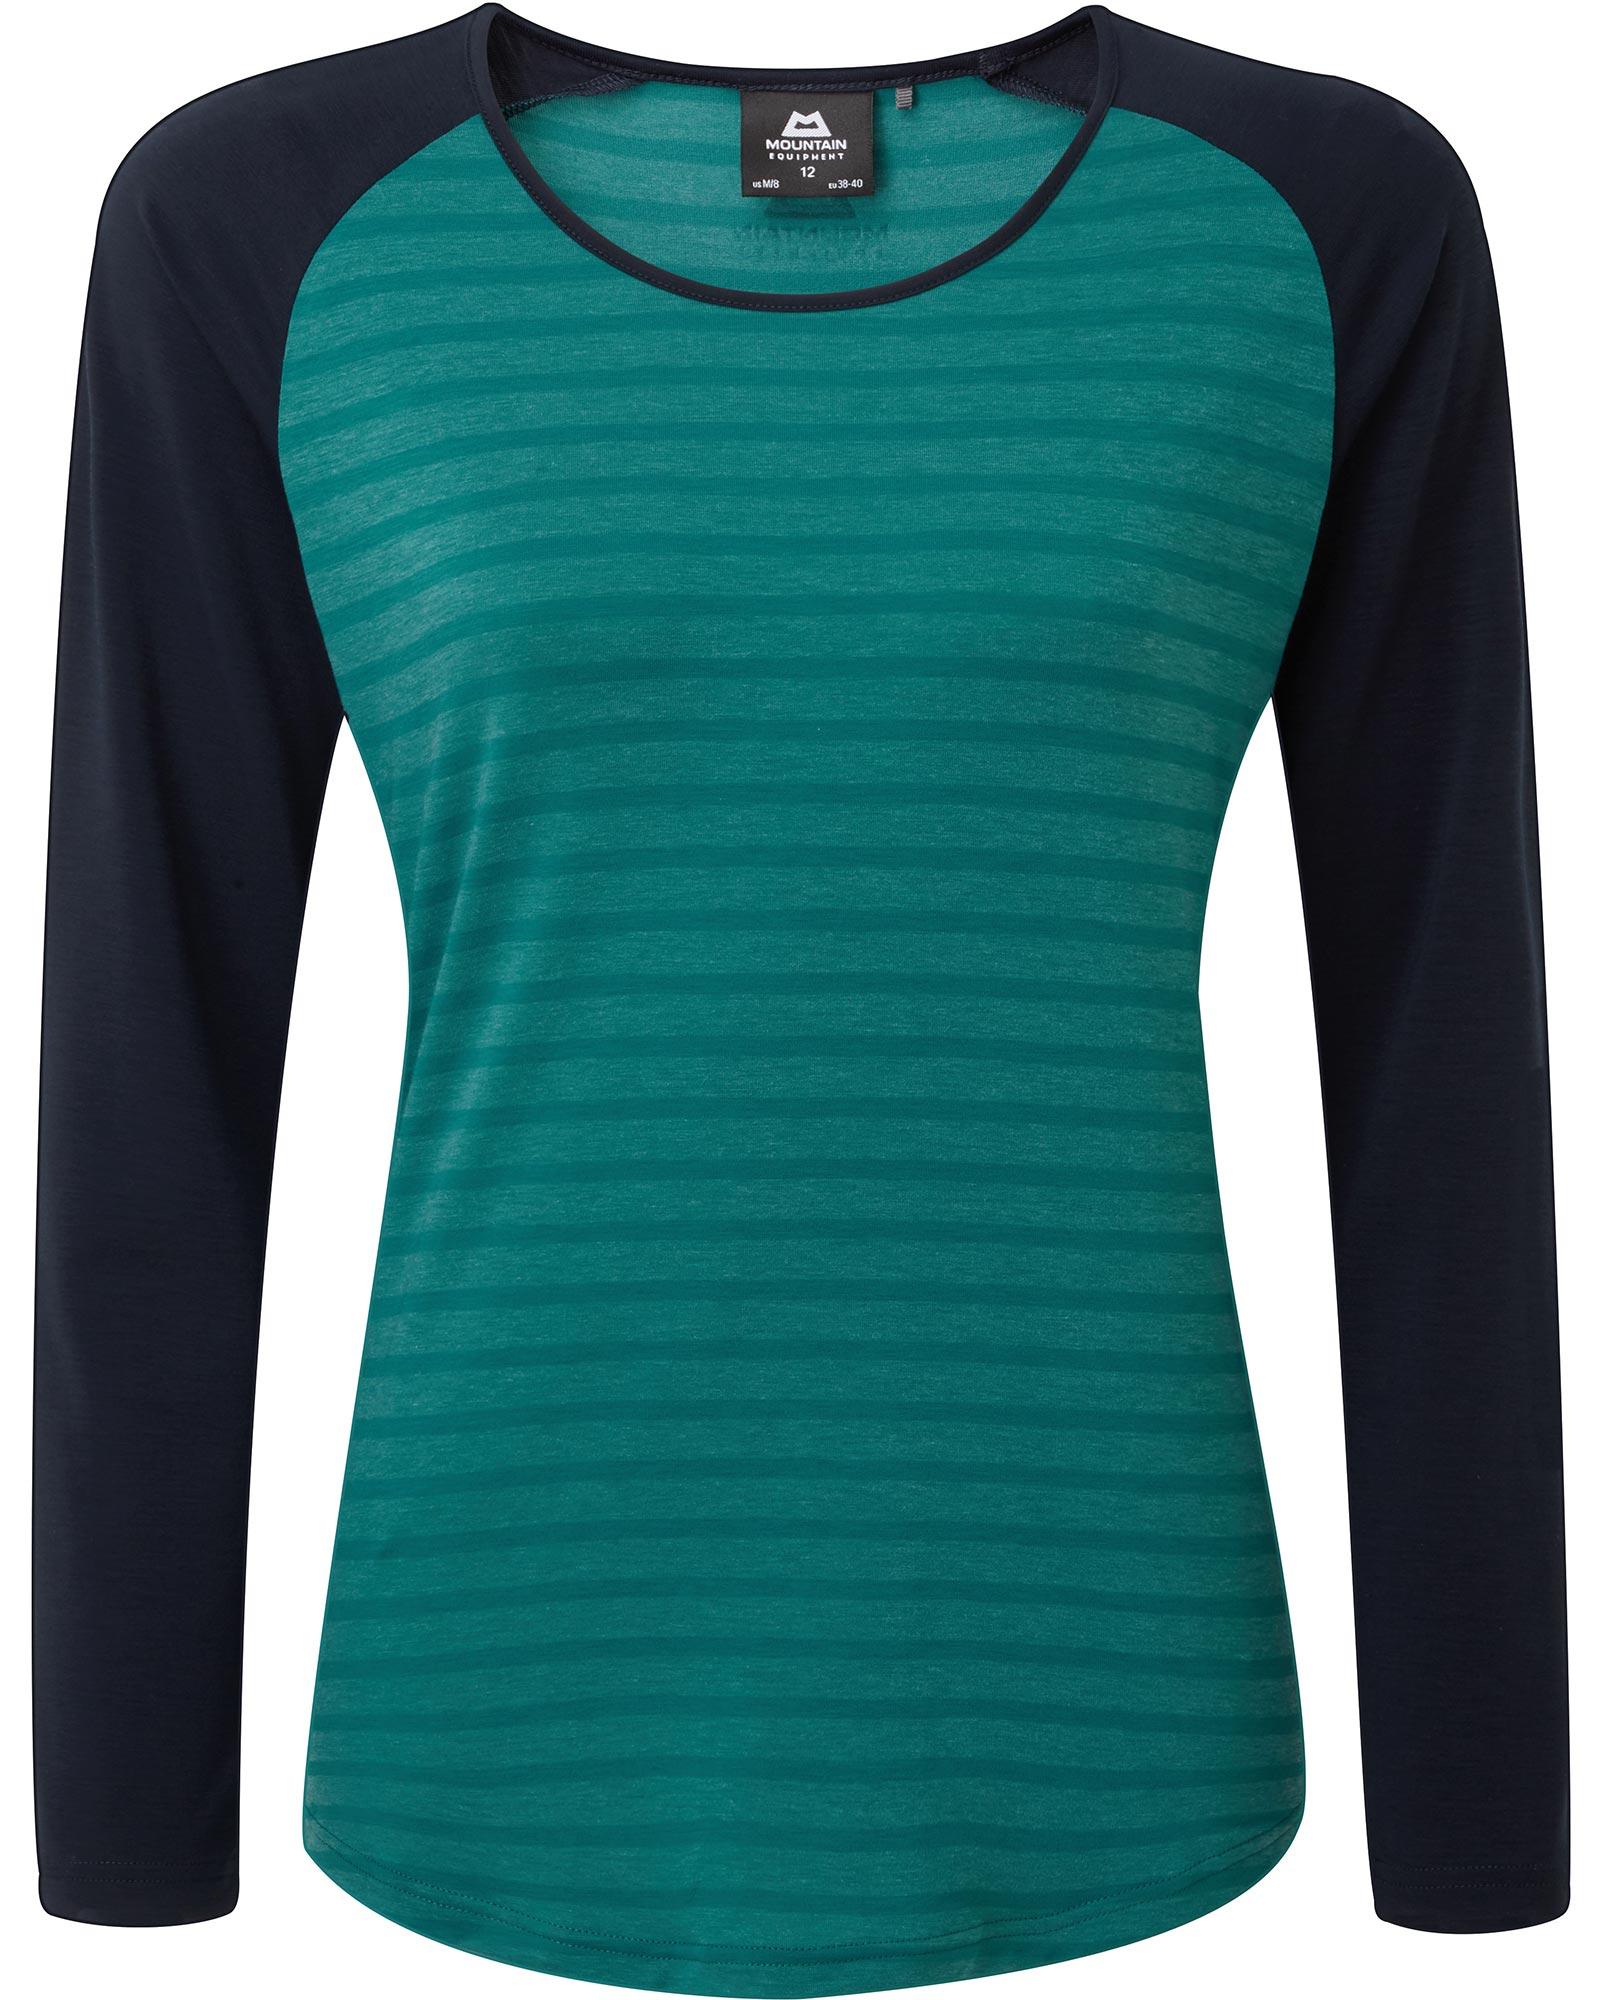 Mountain Equipment Women's Redline T-Shirt 0